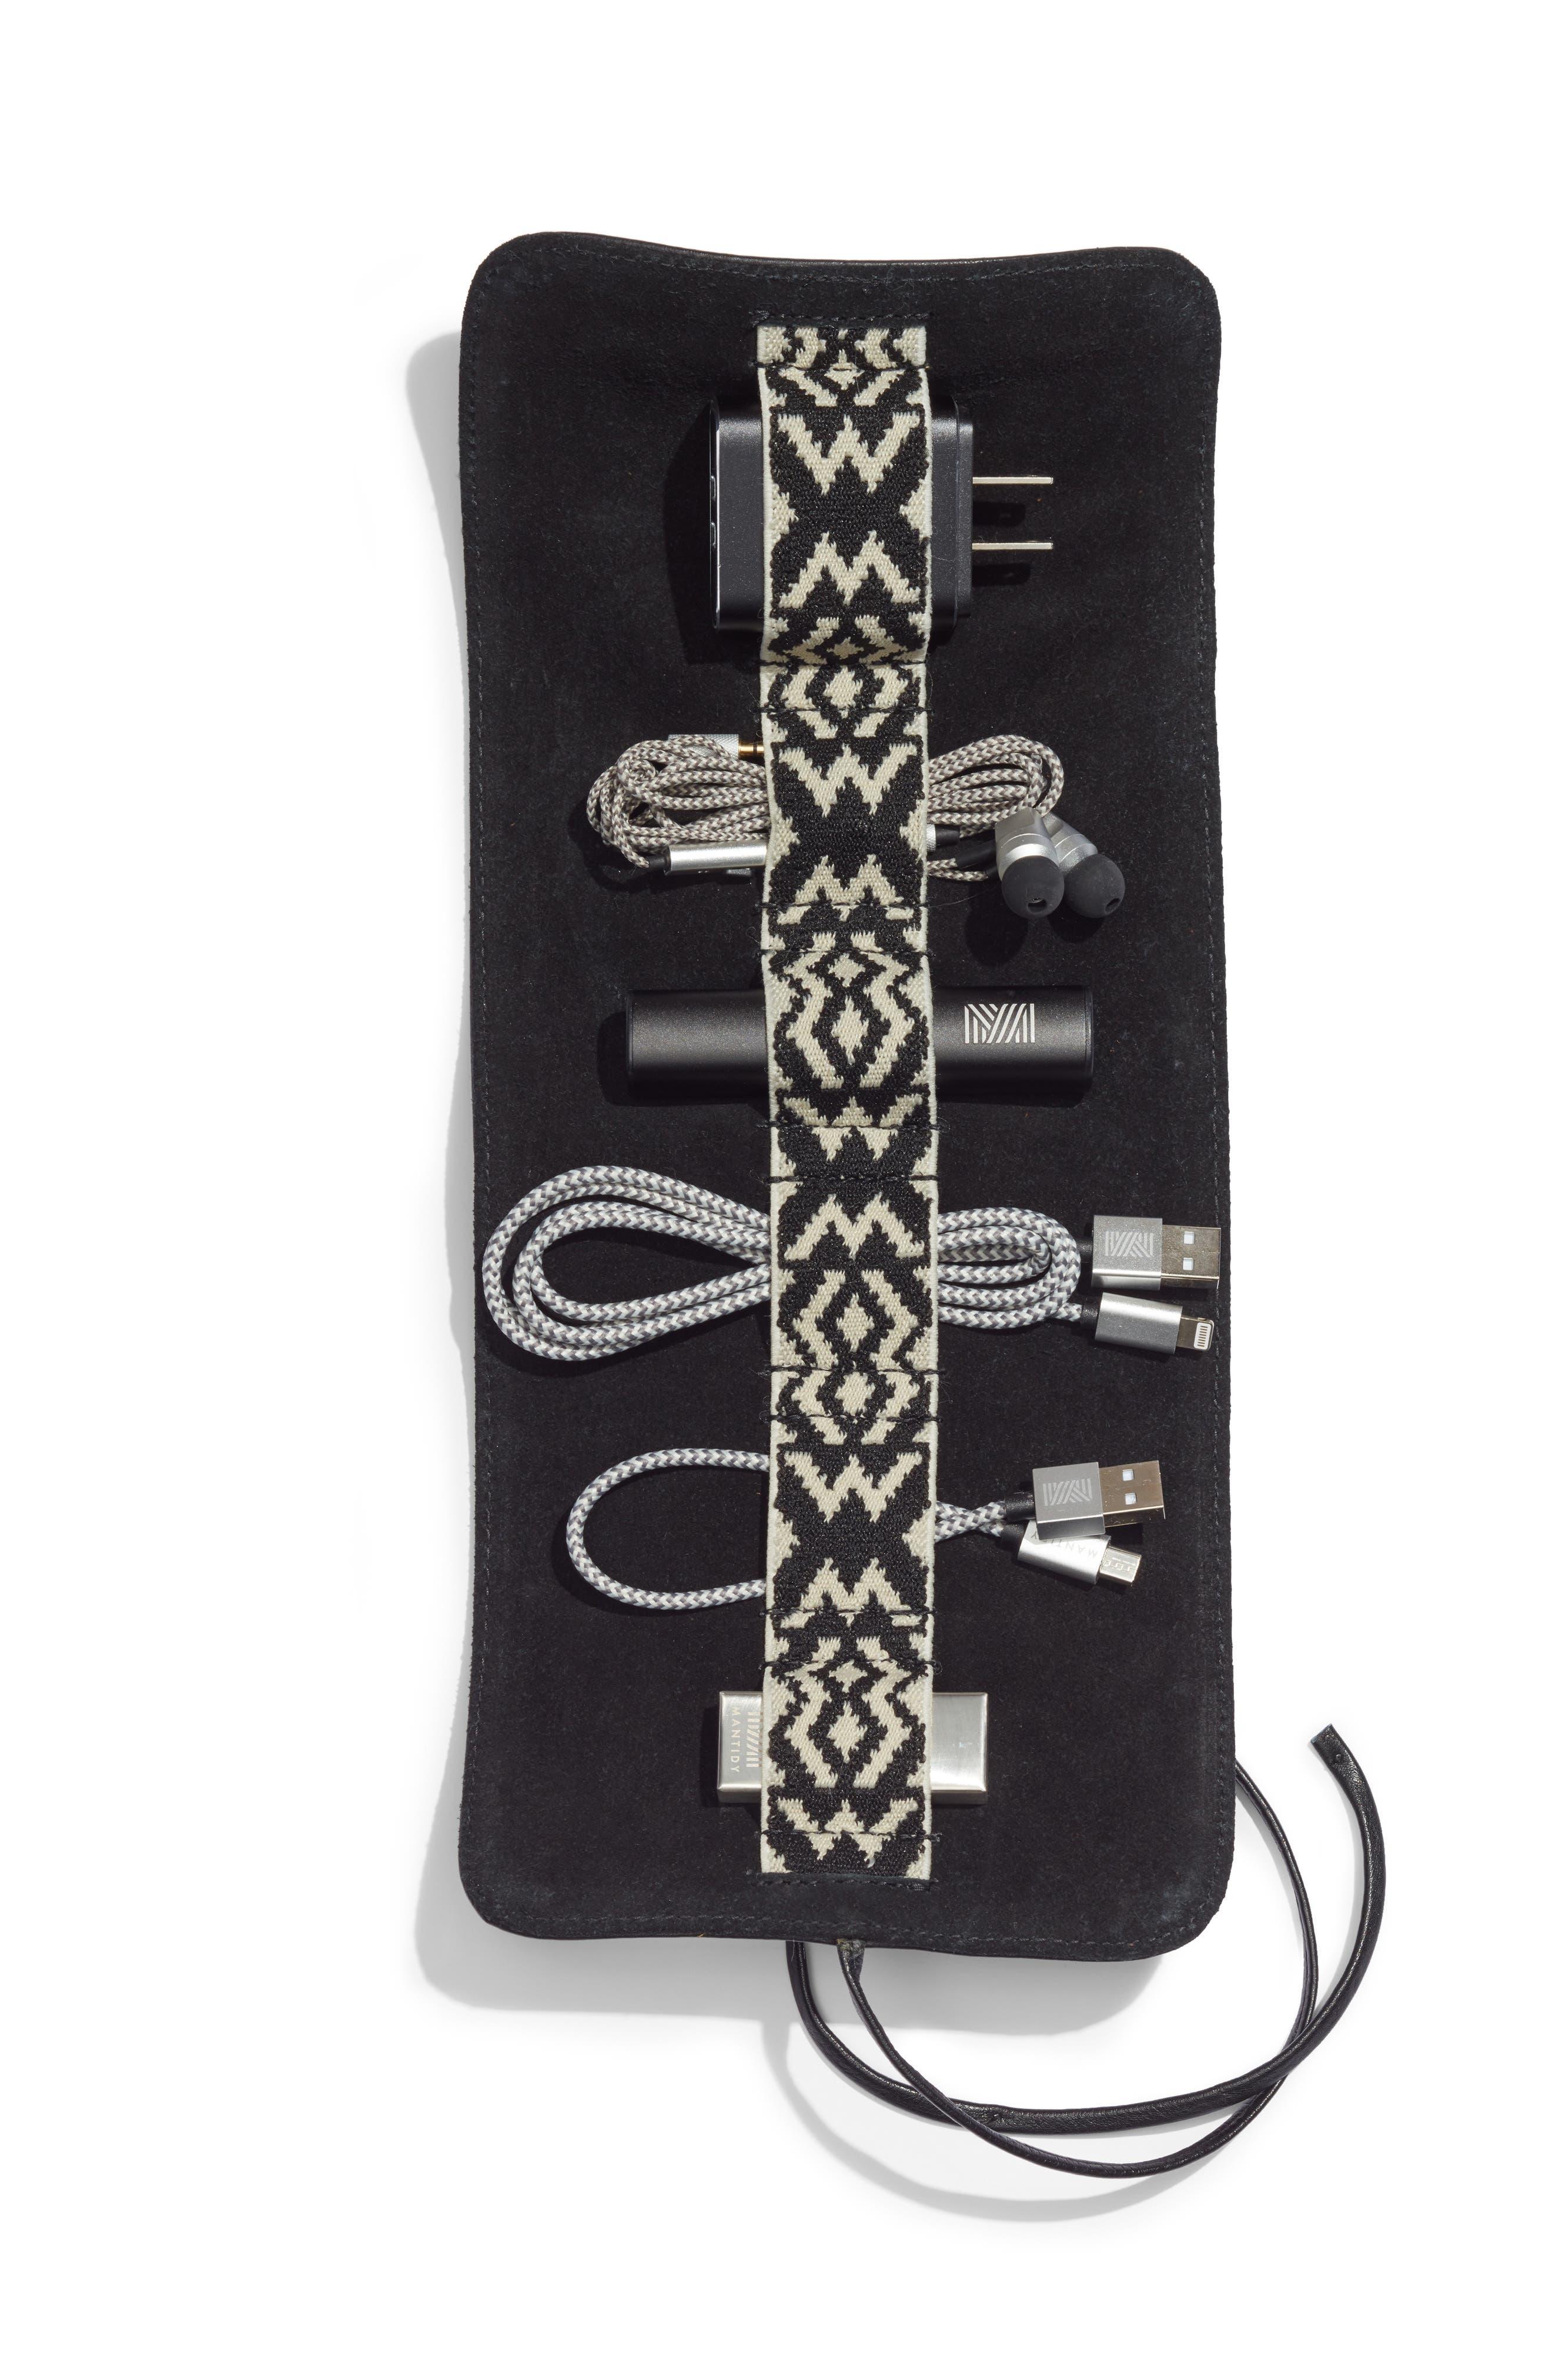 Soda Says x Mantidy Gaucho Tech Roll iPhone 7/8 Accessories Kit & Power Bank,                             Main thumbnail 1, color,                             BLACK